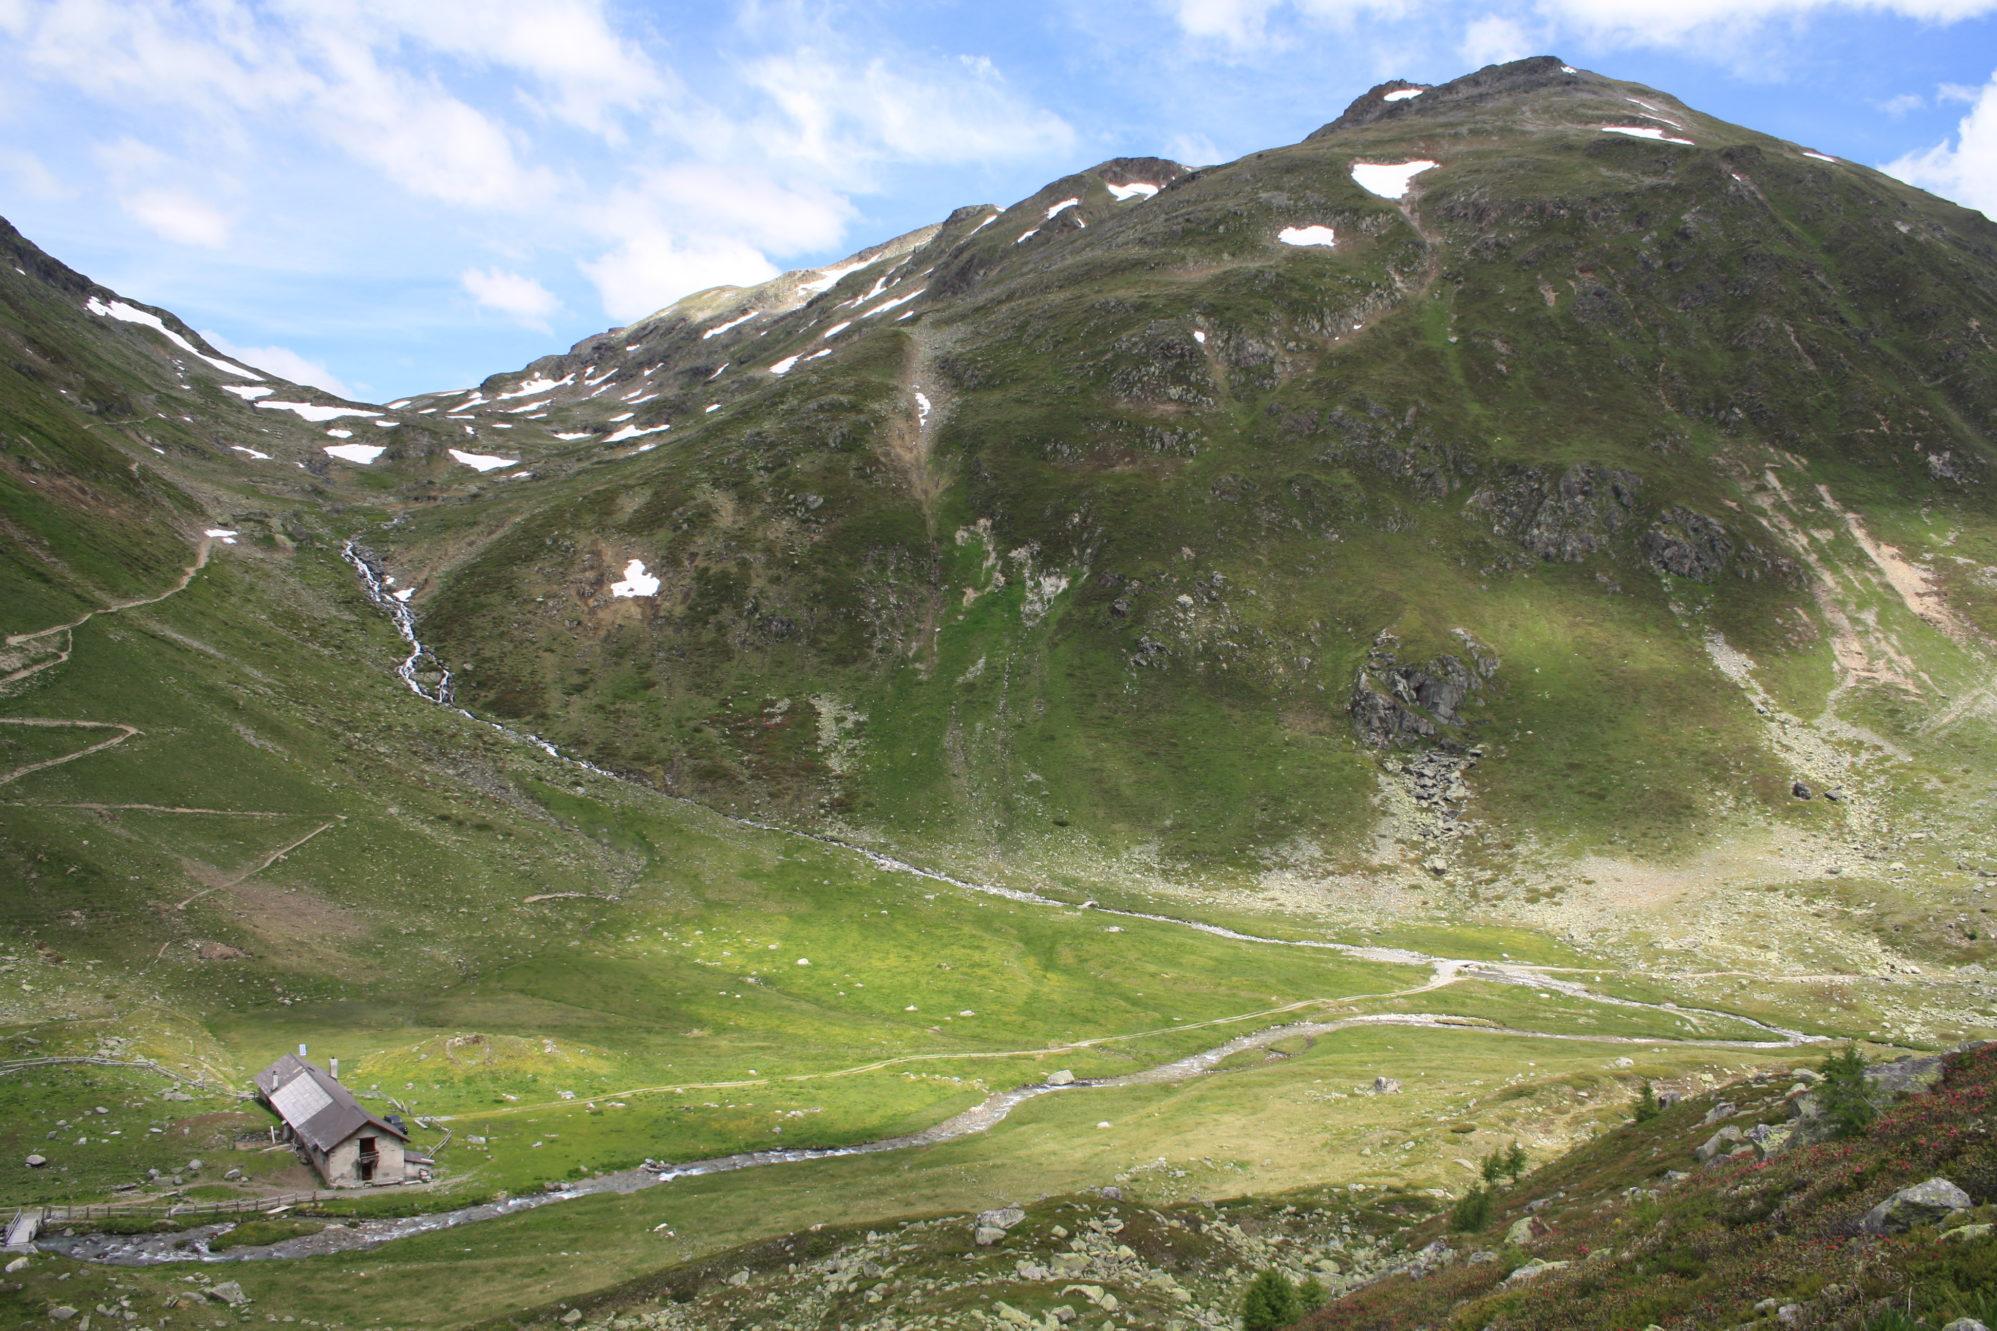 Blick auf Alp Funtauna im Oberengadin